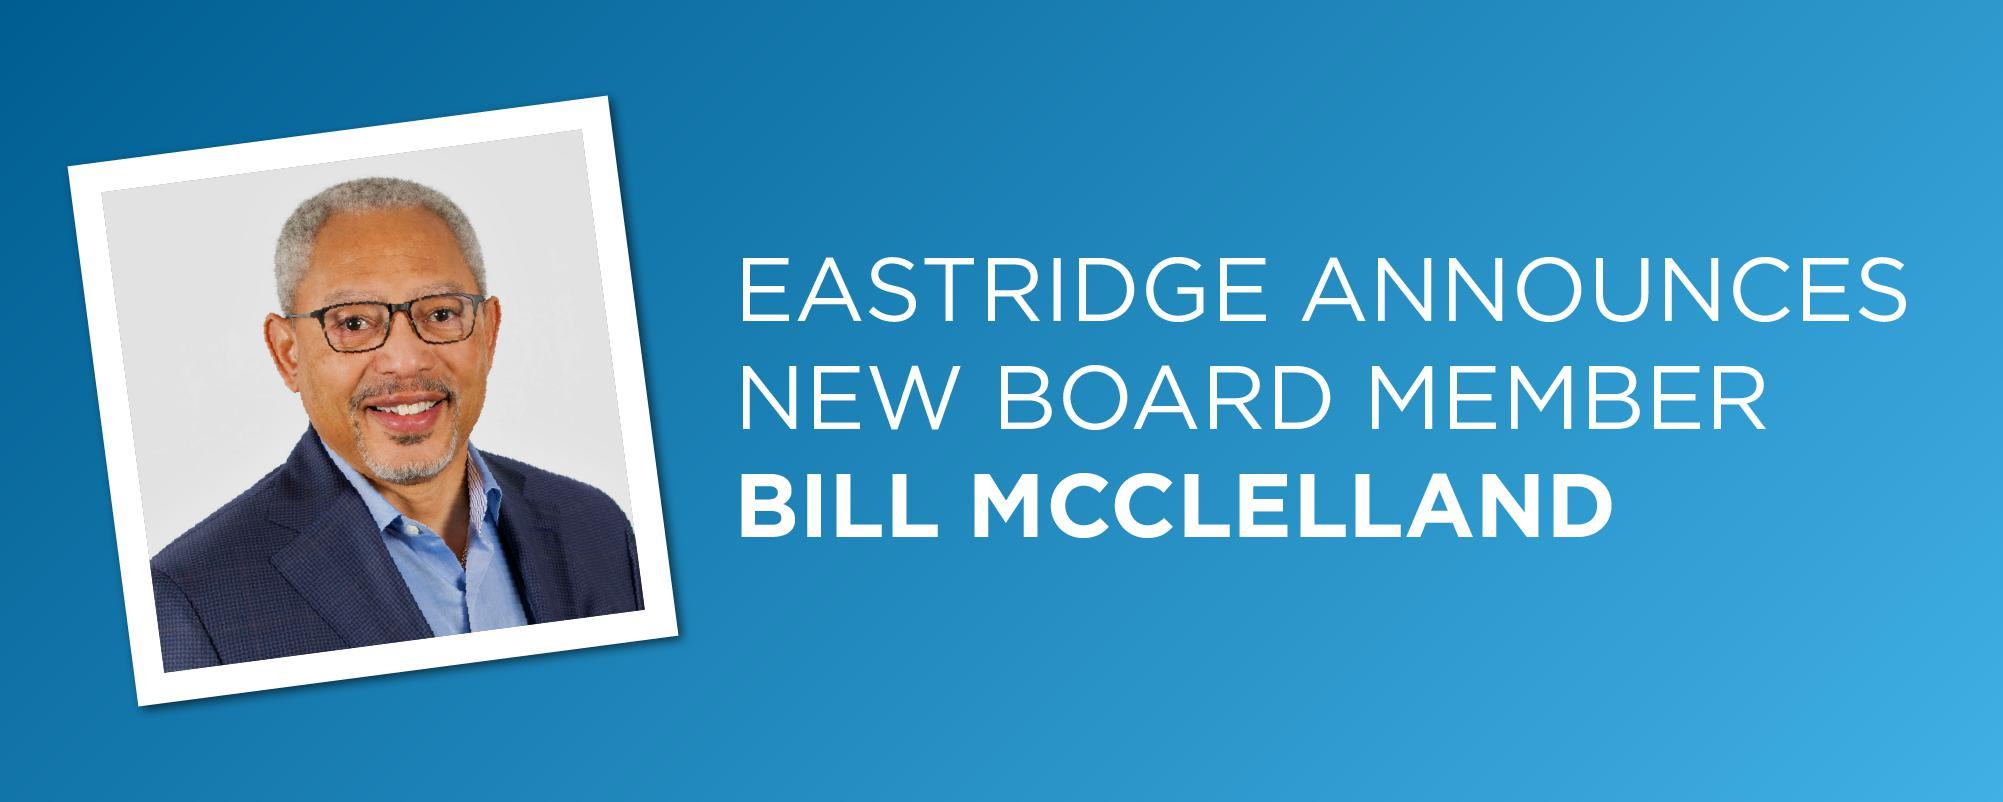 Eastridge Announces New Board Member: Bill McClelland